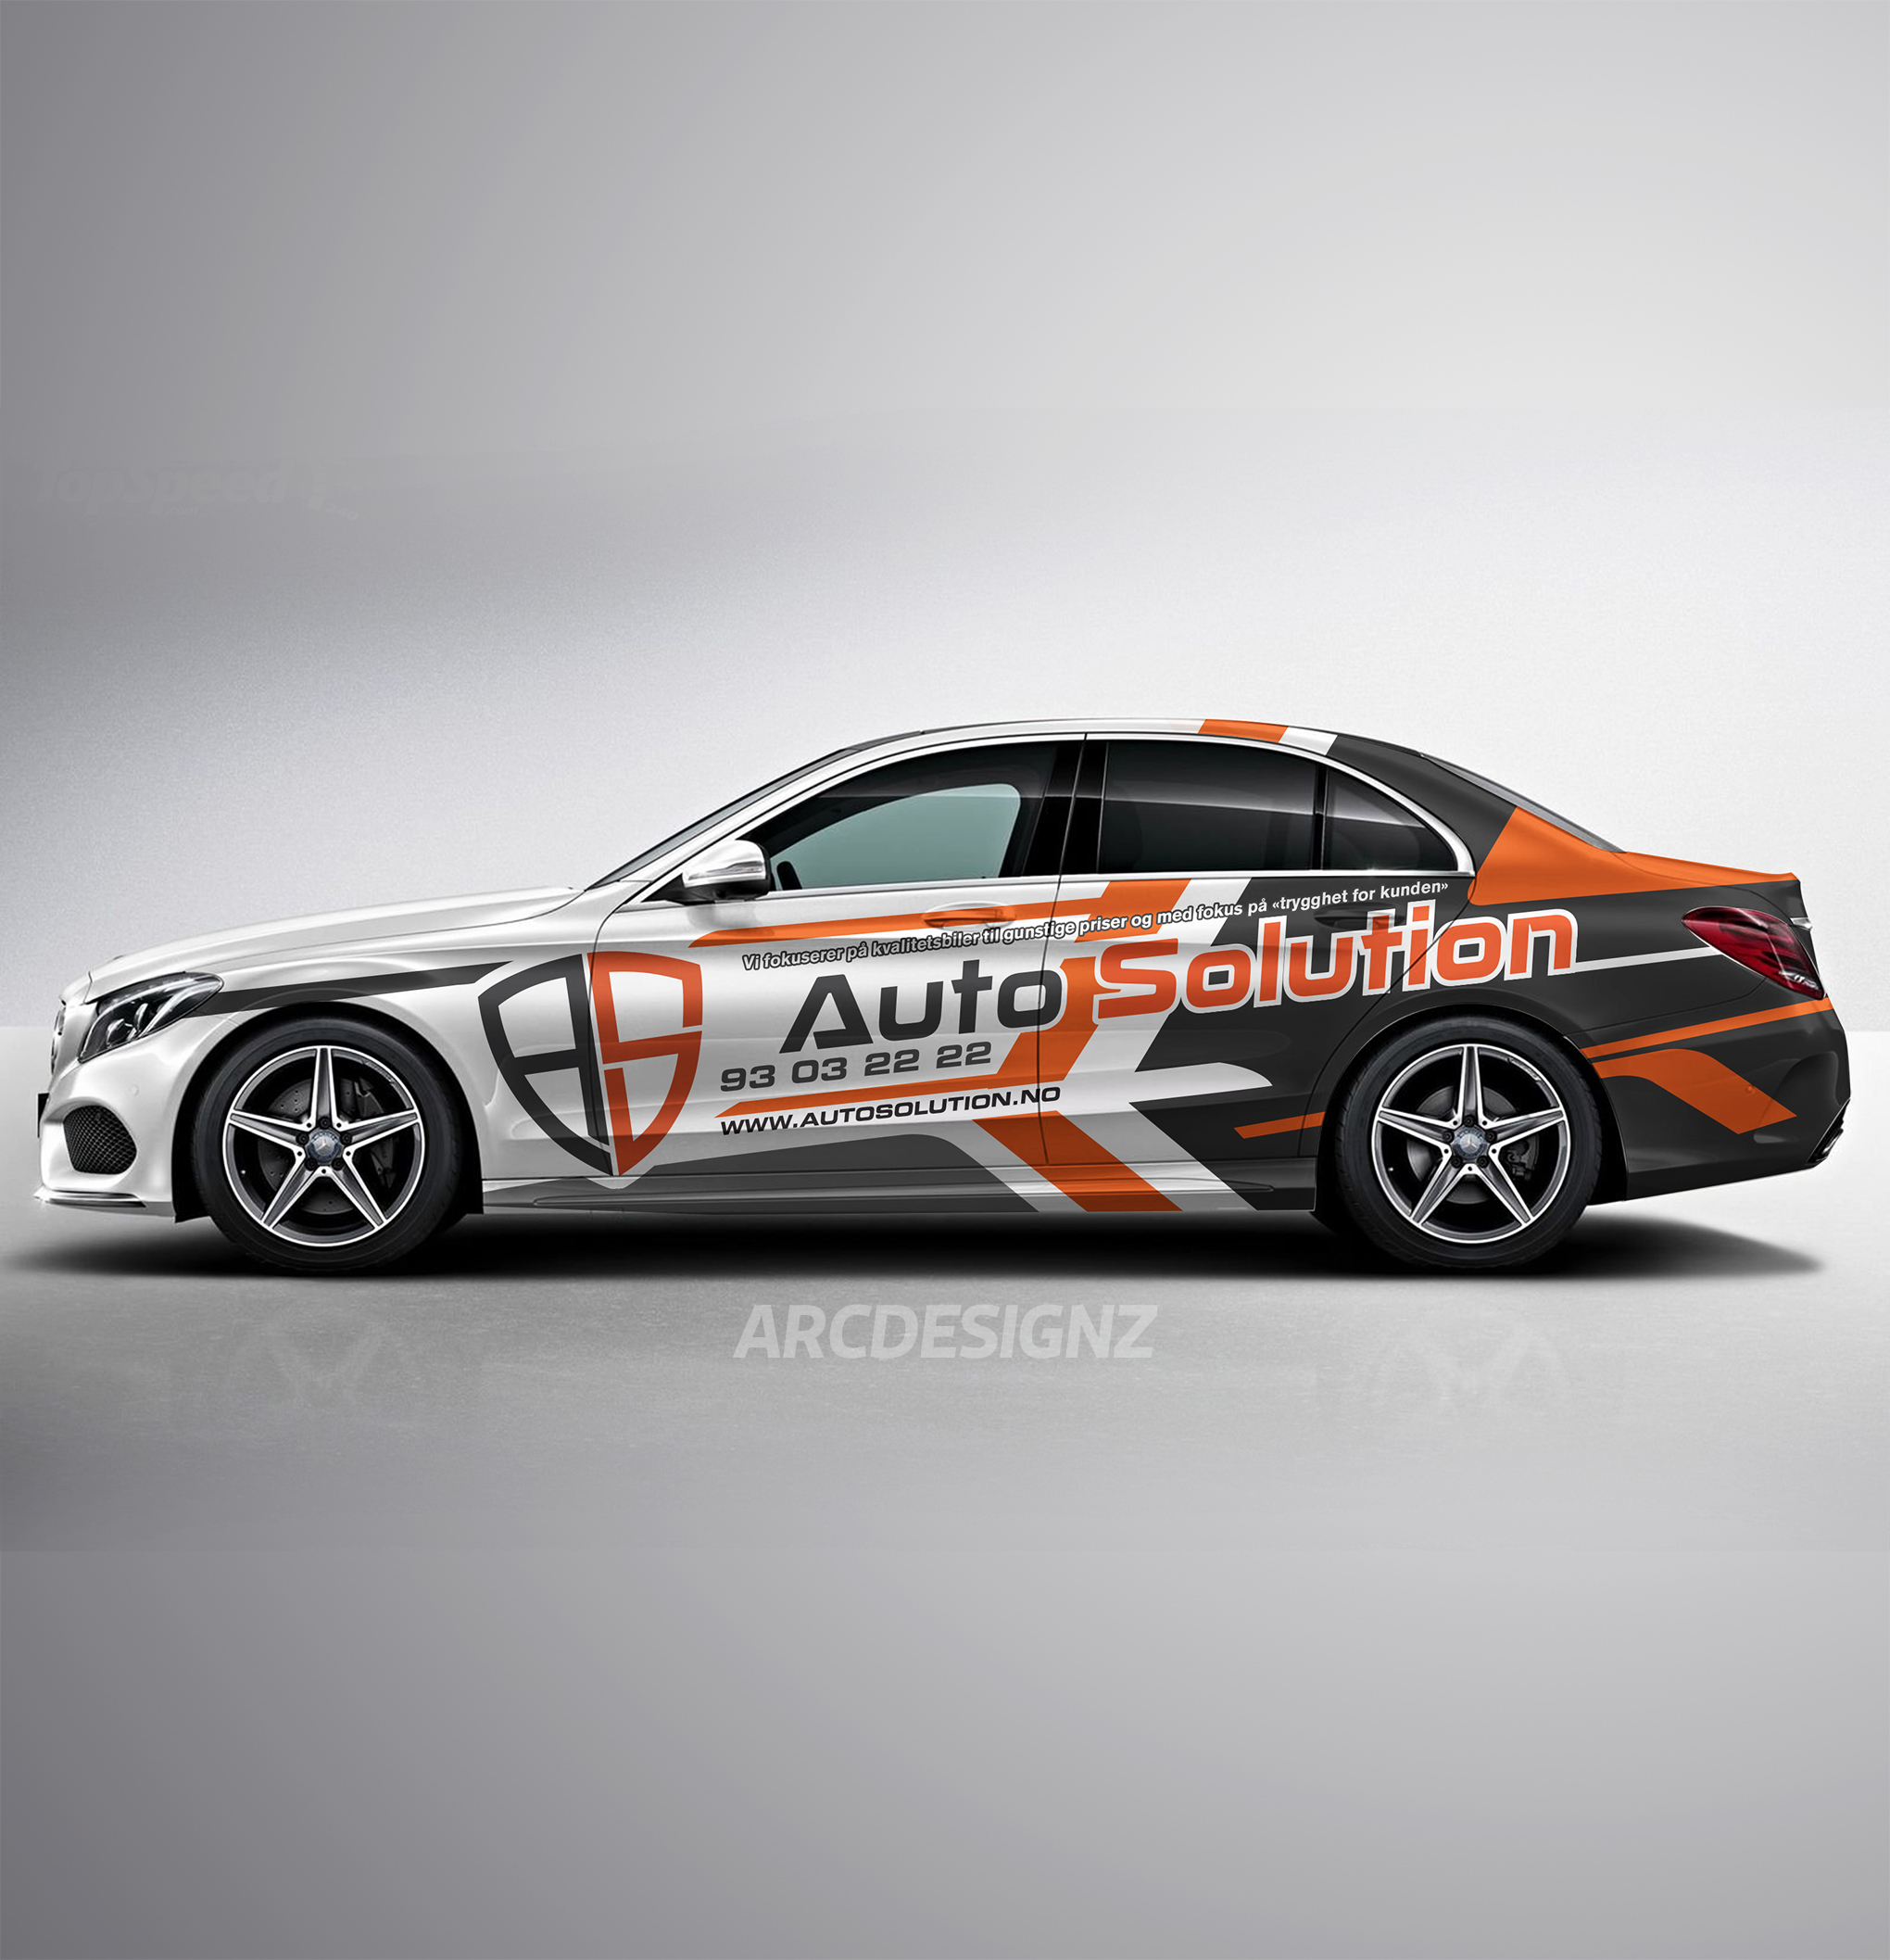 Sporty Wrap For Mercedes 99designs Car Sticker Design Vehicle Signage Car Wrap [ 2115 x 2040 Pixel ]